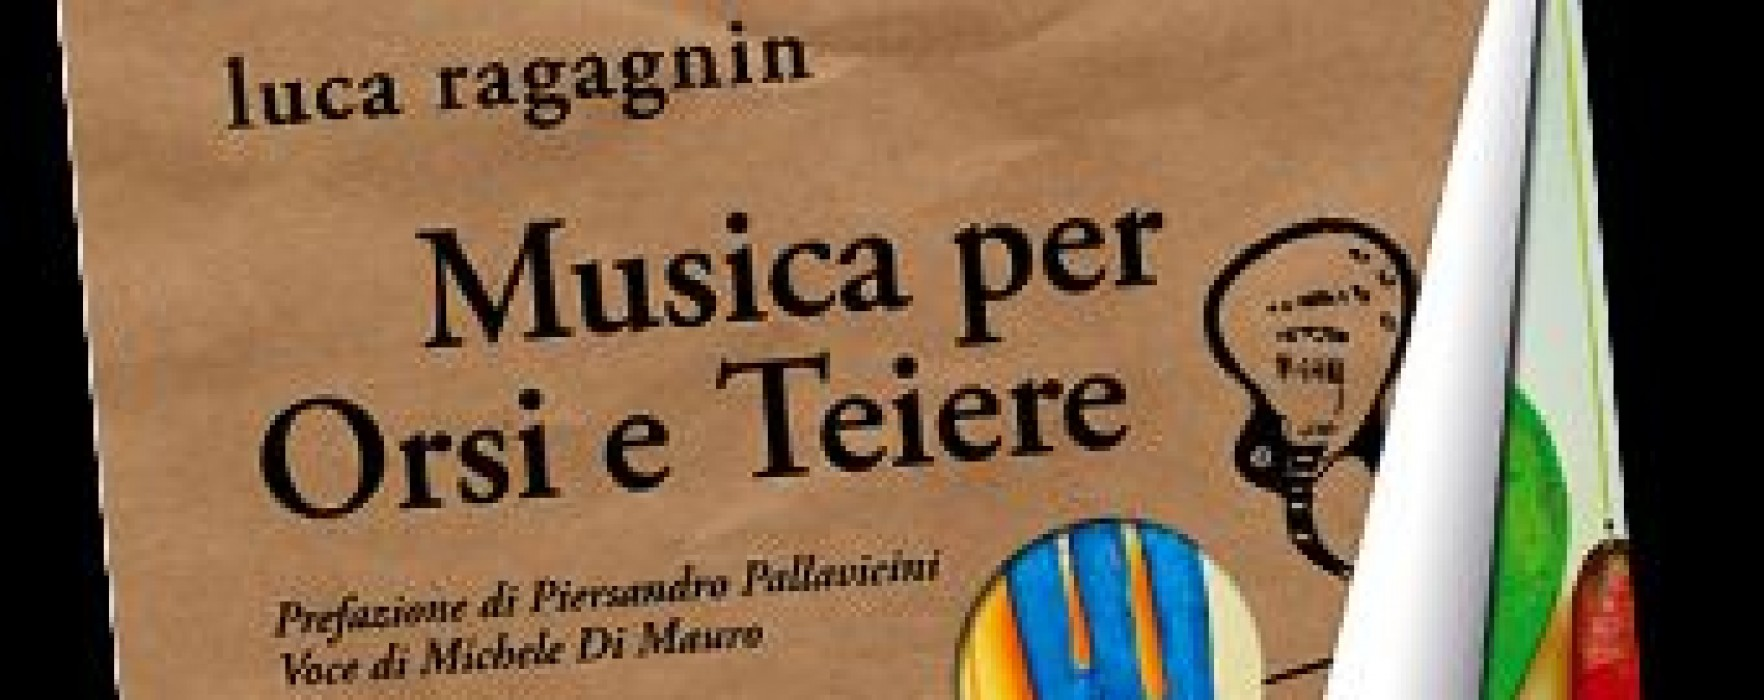 Musica per Orsi e Teiere di Luca Ragagnin